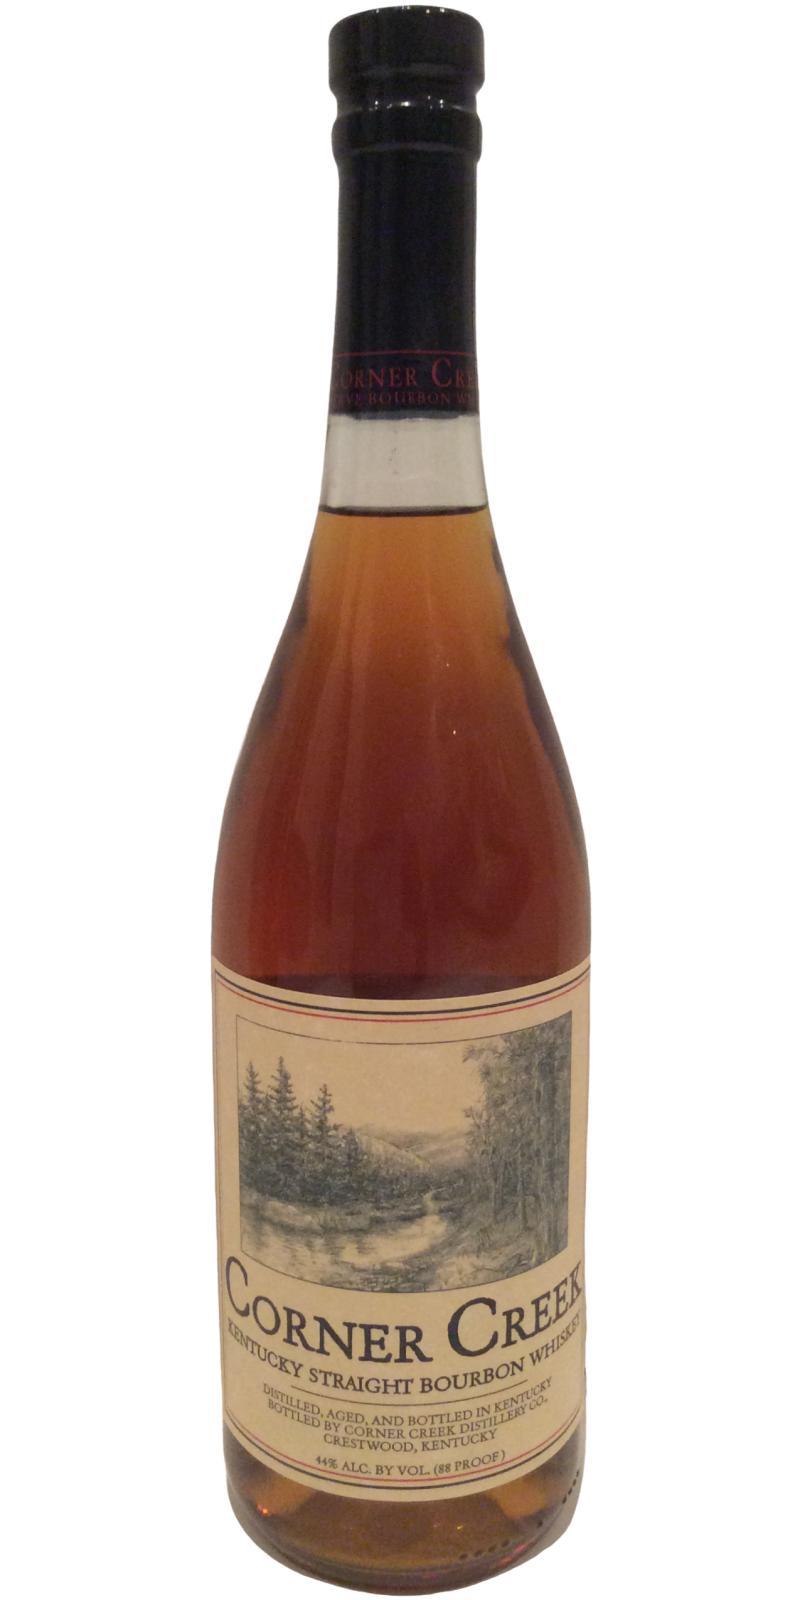 Corner Creek Kentucky Straight Bourbon Whiskey